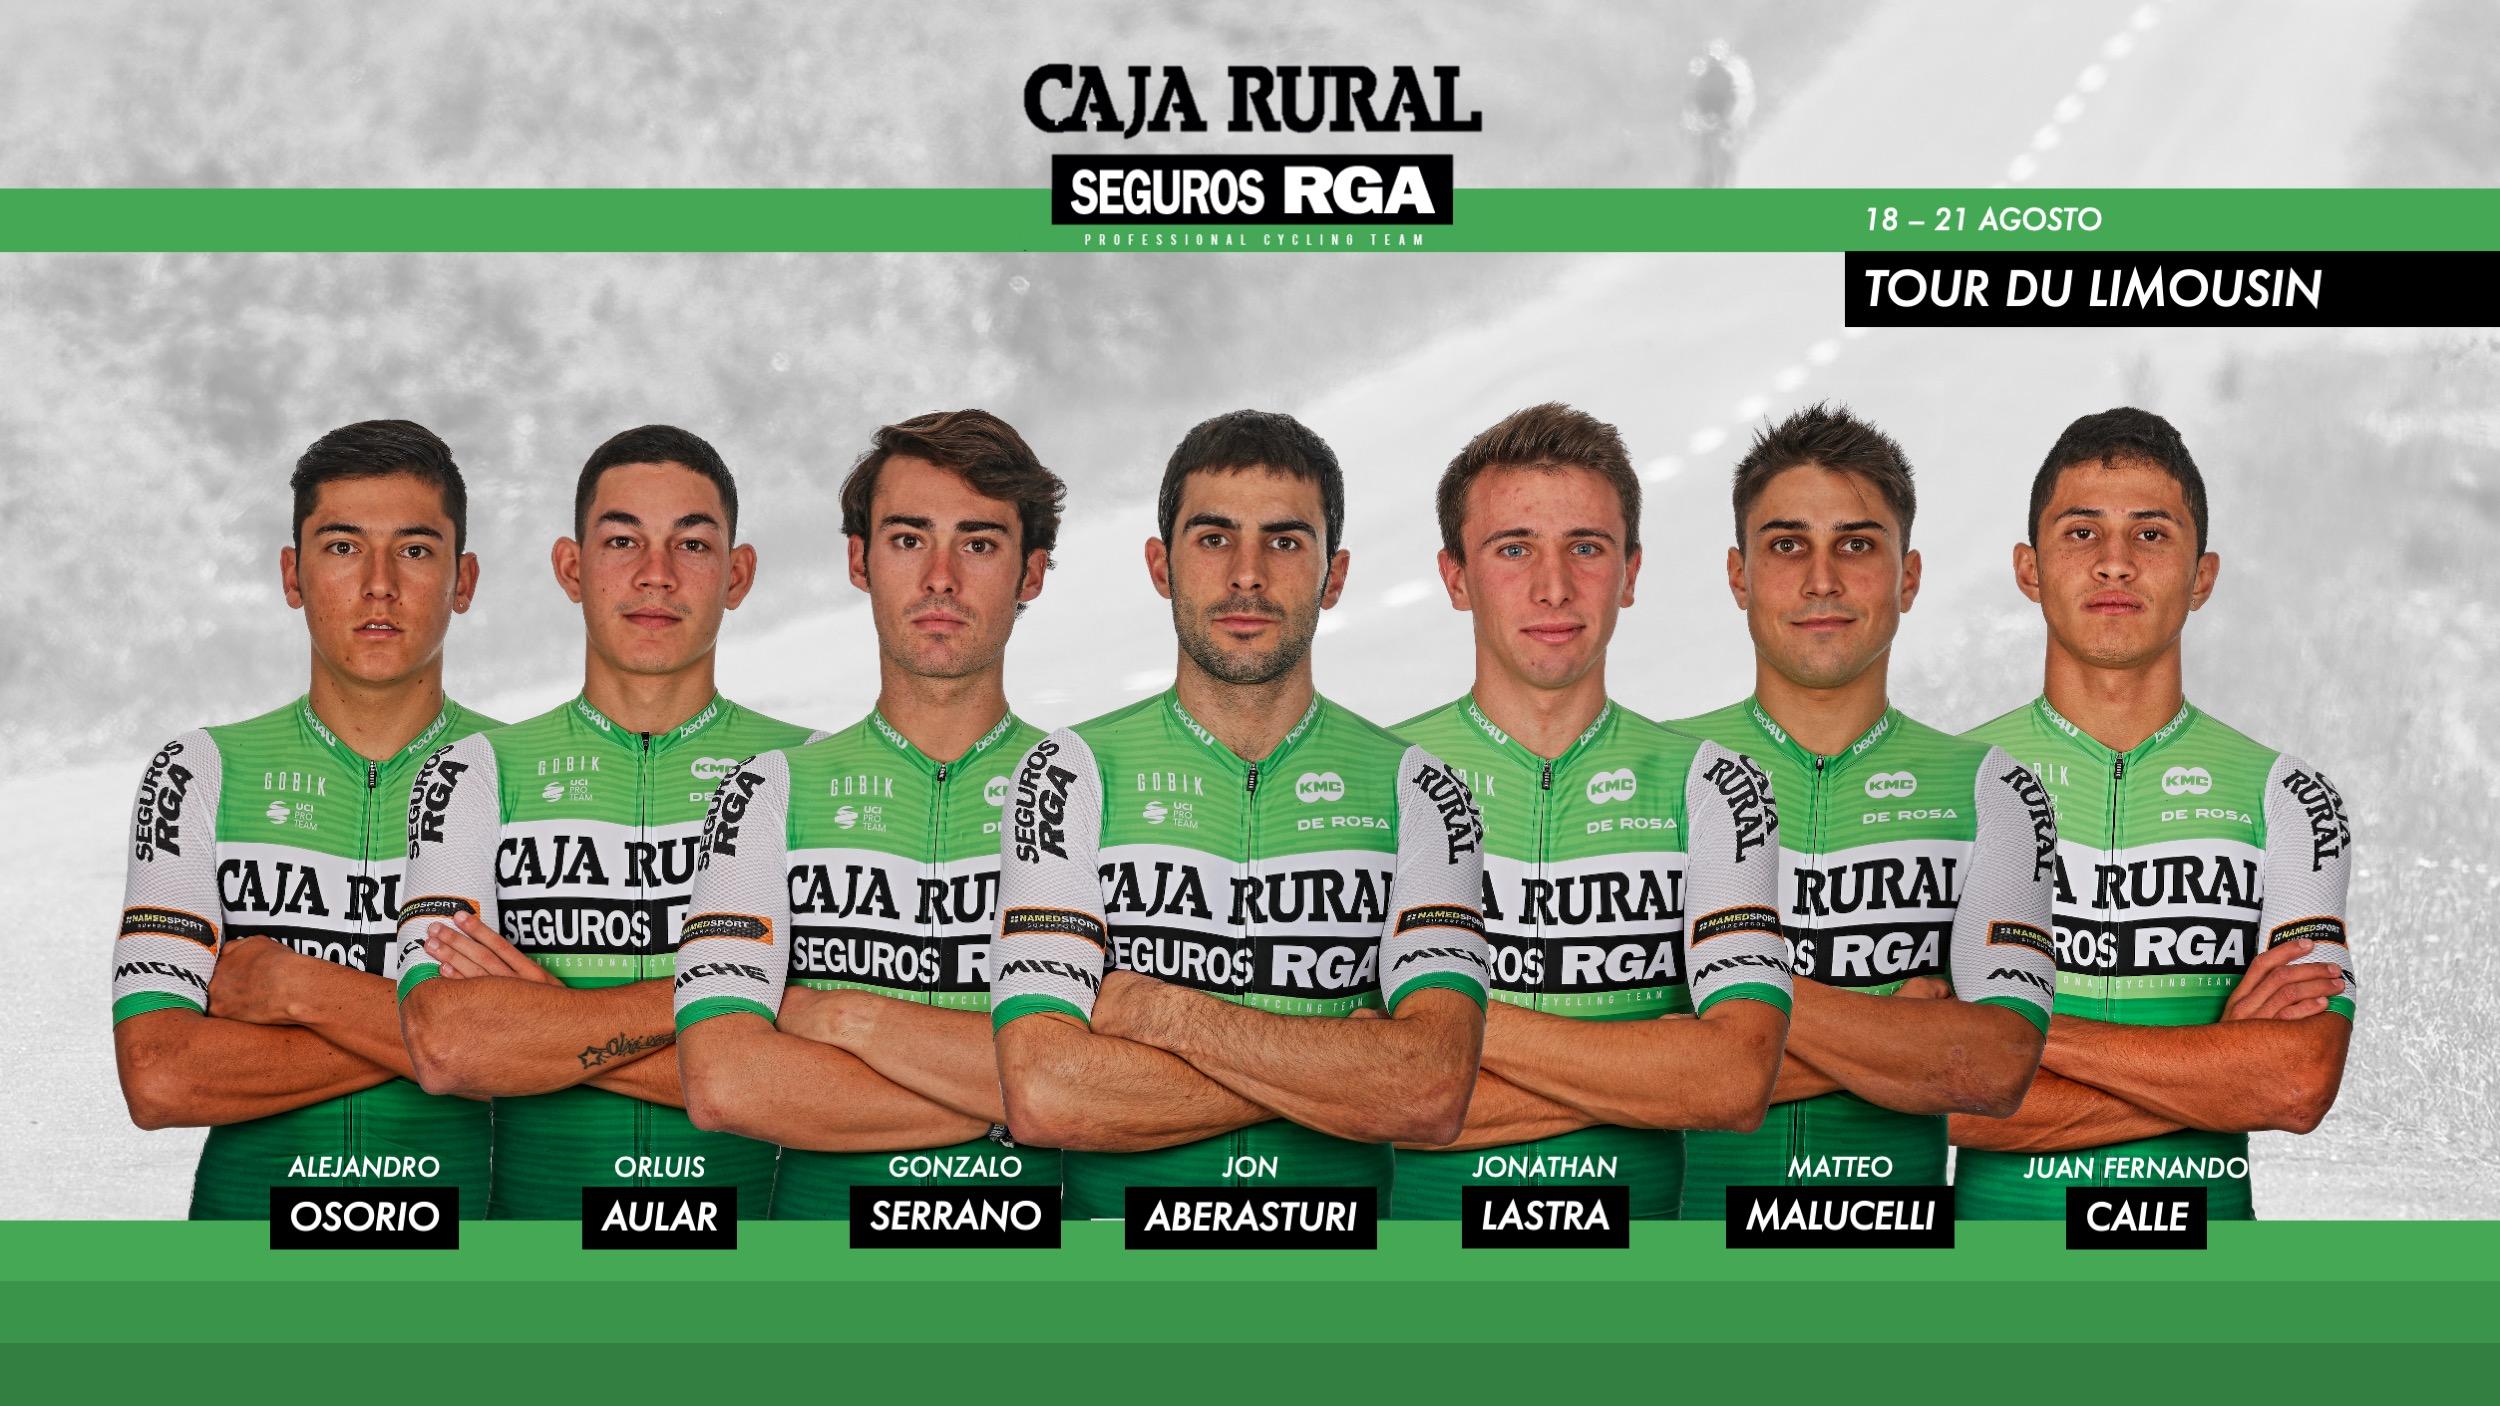 Caja Rural-Seguros RGA acude con ambición al Tour du Limousin